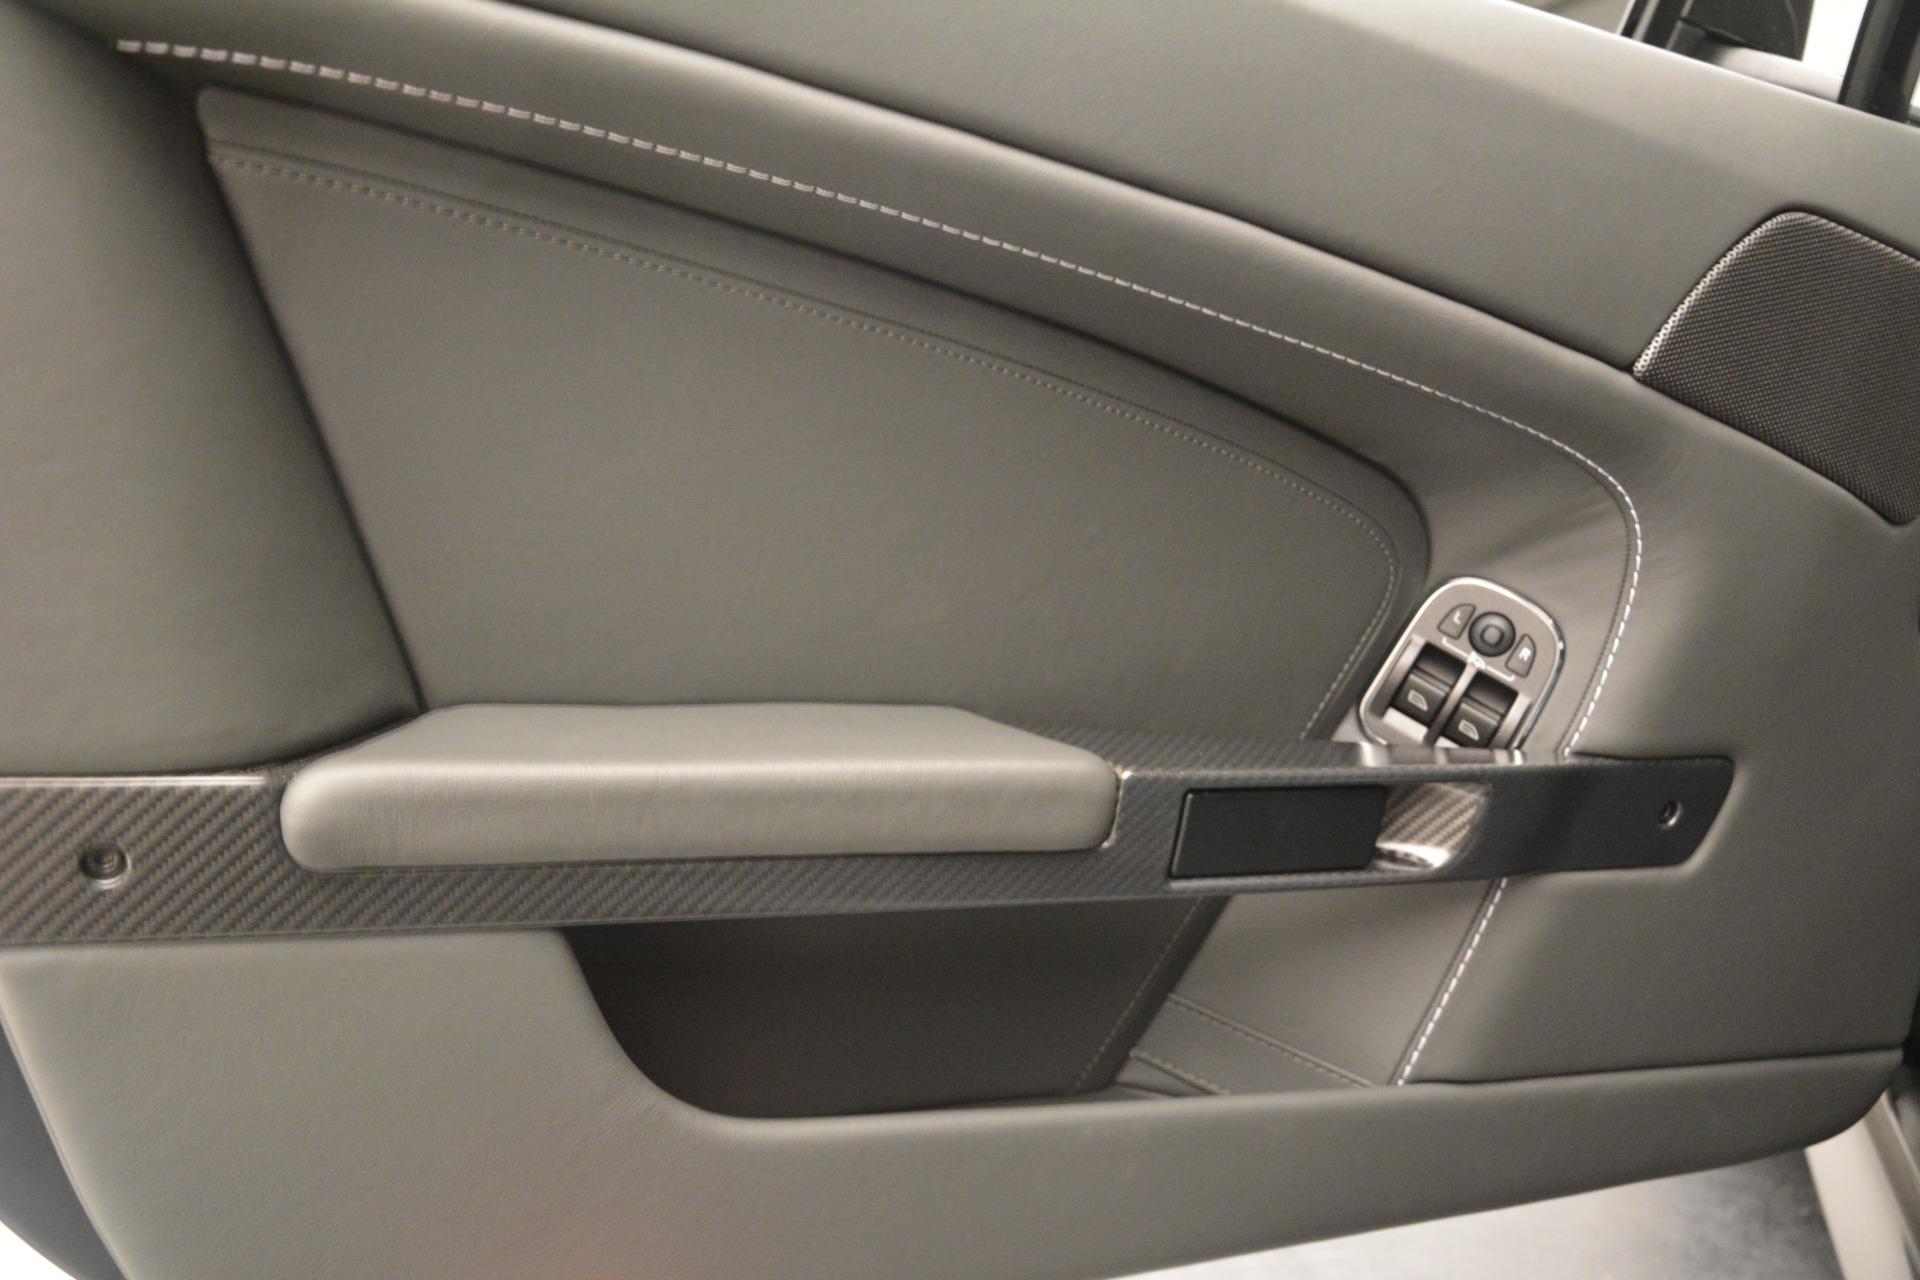 Used 2012 Aston Martin V12 Vantage Coupe For Sale In Greenwich, CT. Alfa Romeo of Greenwich, 7425 2544_p16